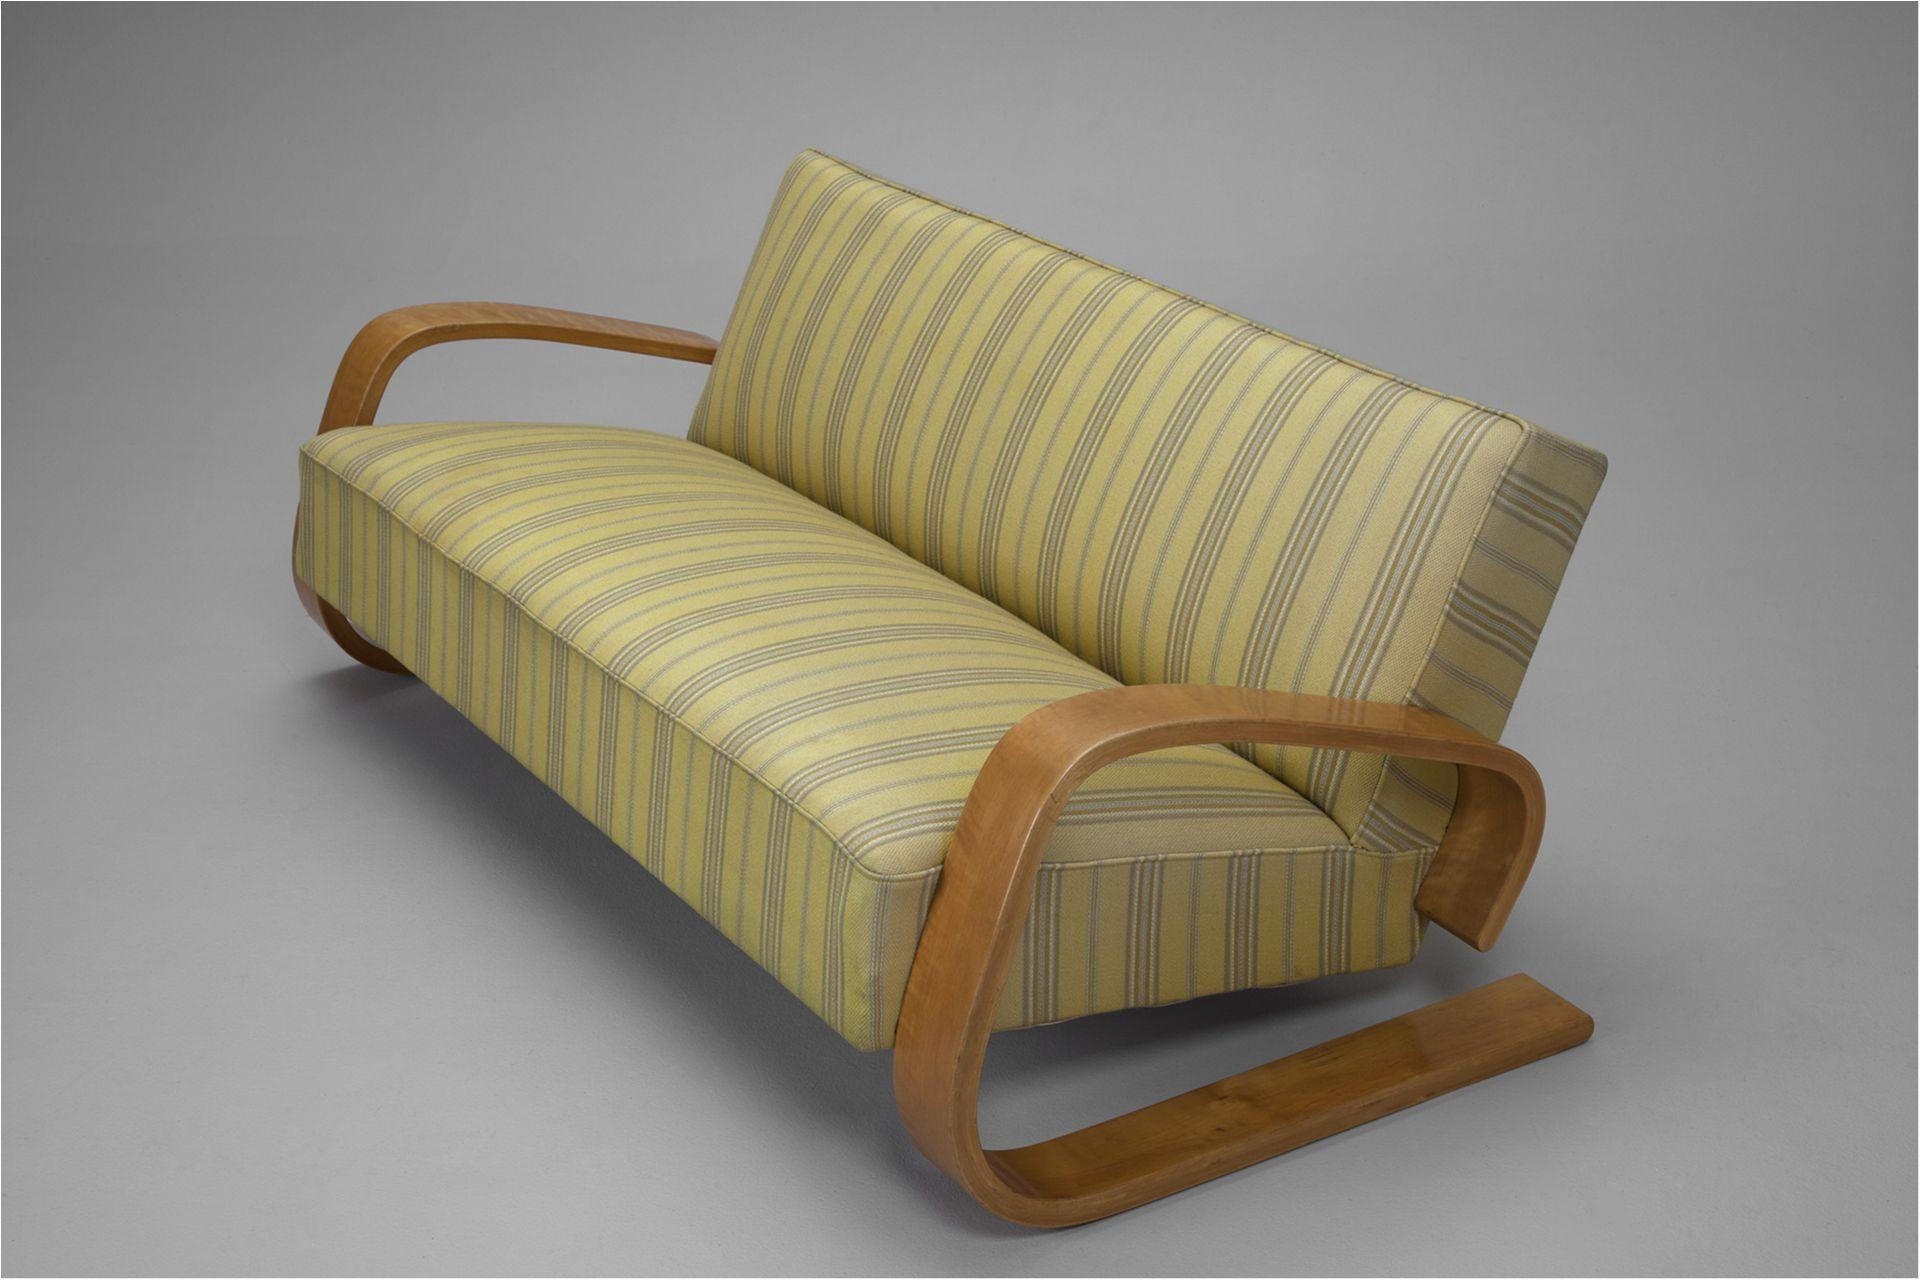 Mid century modern sofa tank by alvar aalto 1940s